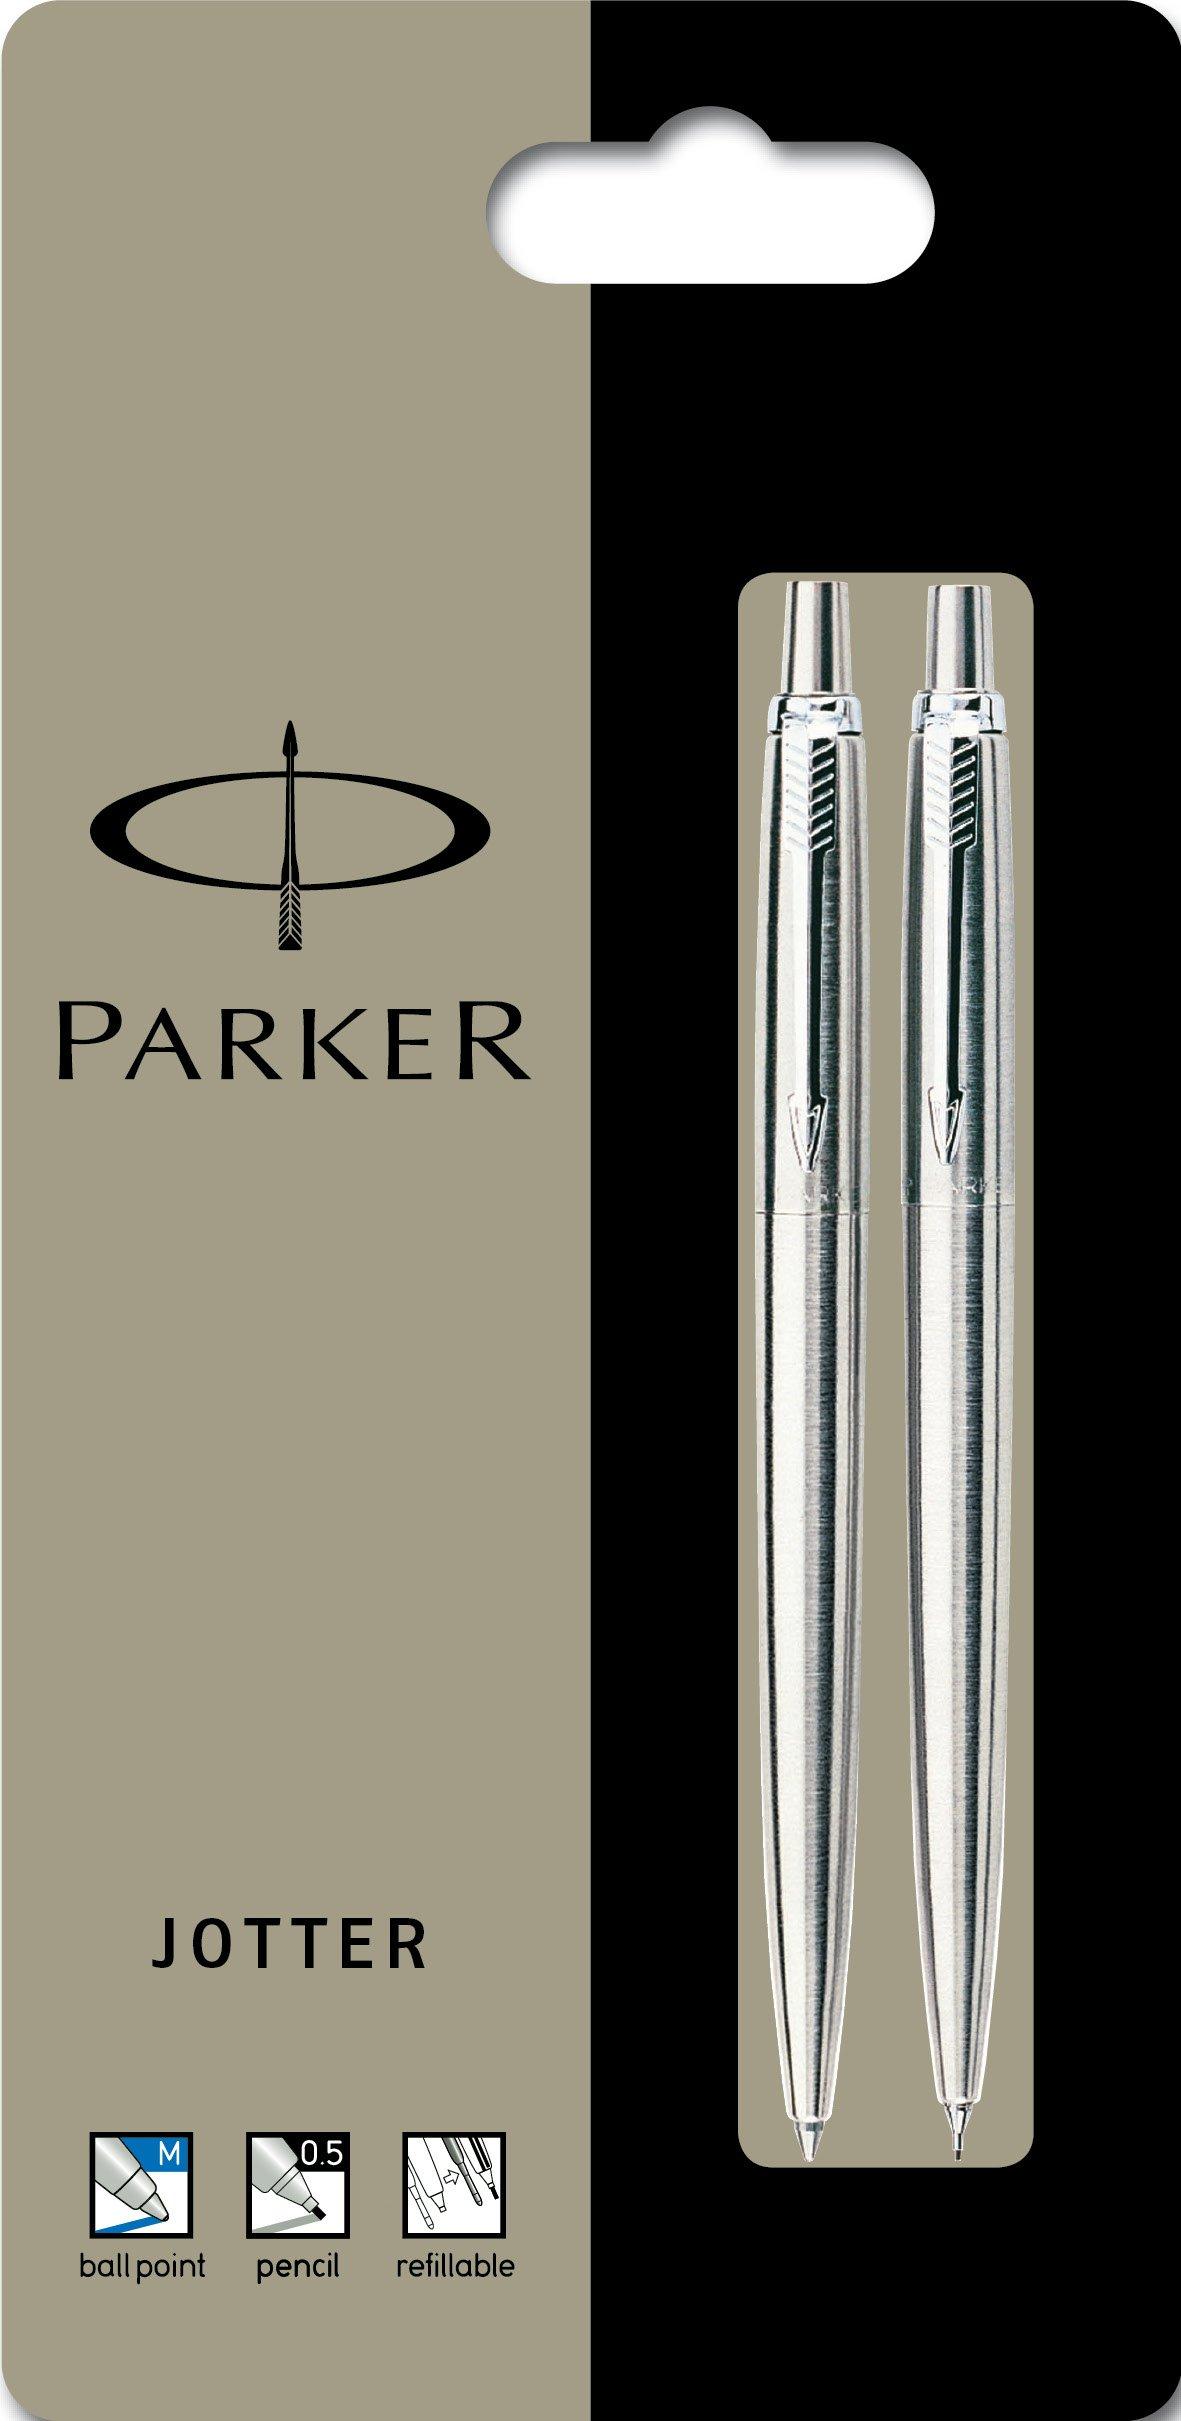 Parker Jotter Stainless Steel Chrome Trim Ball Pen & Mechanical Pencil - Set of 2